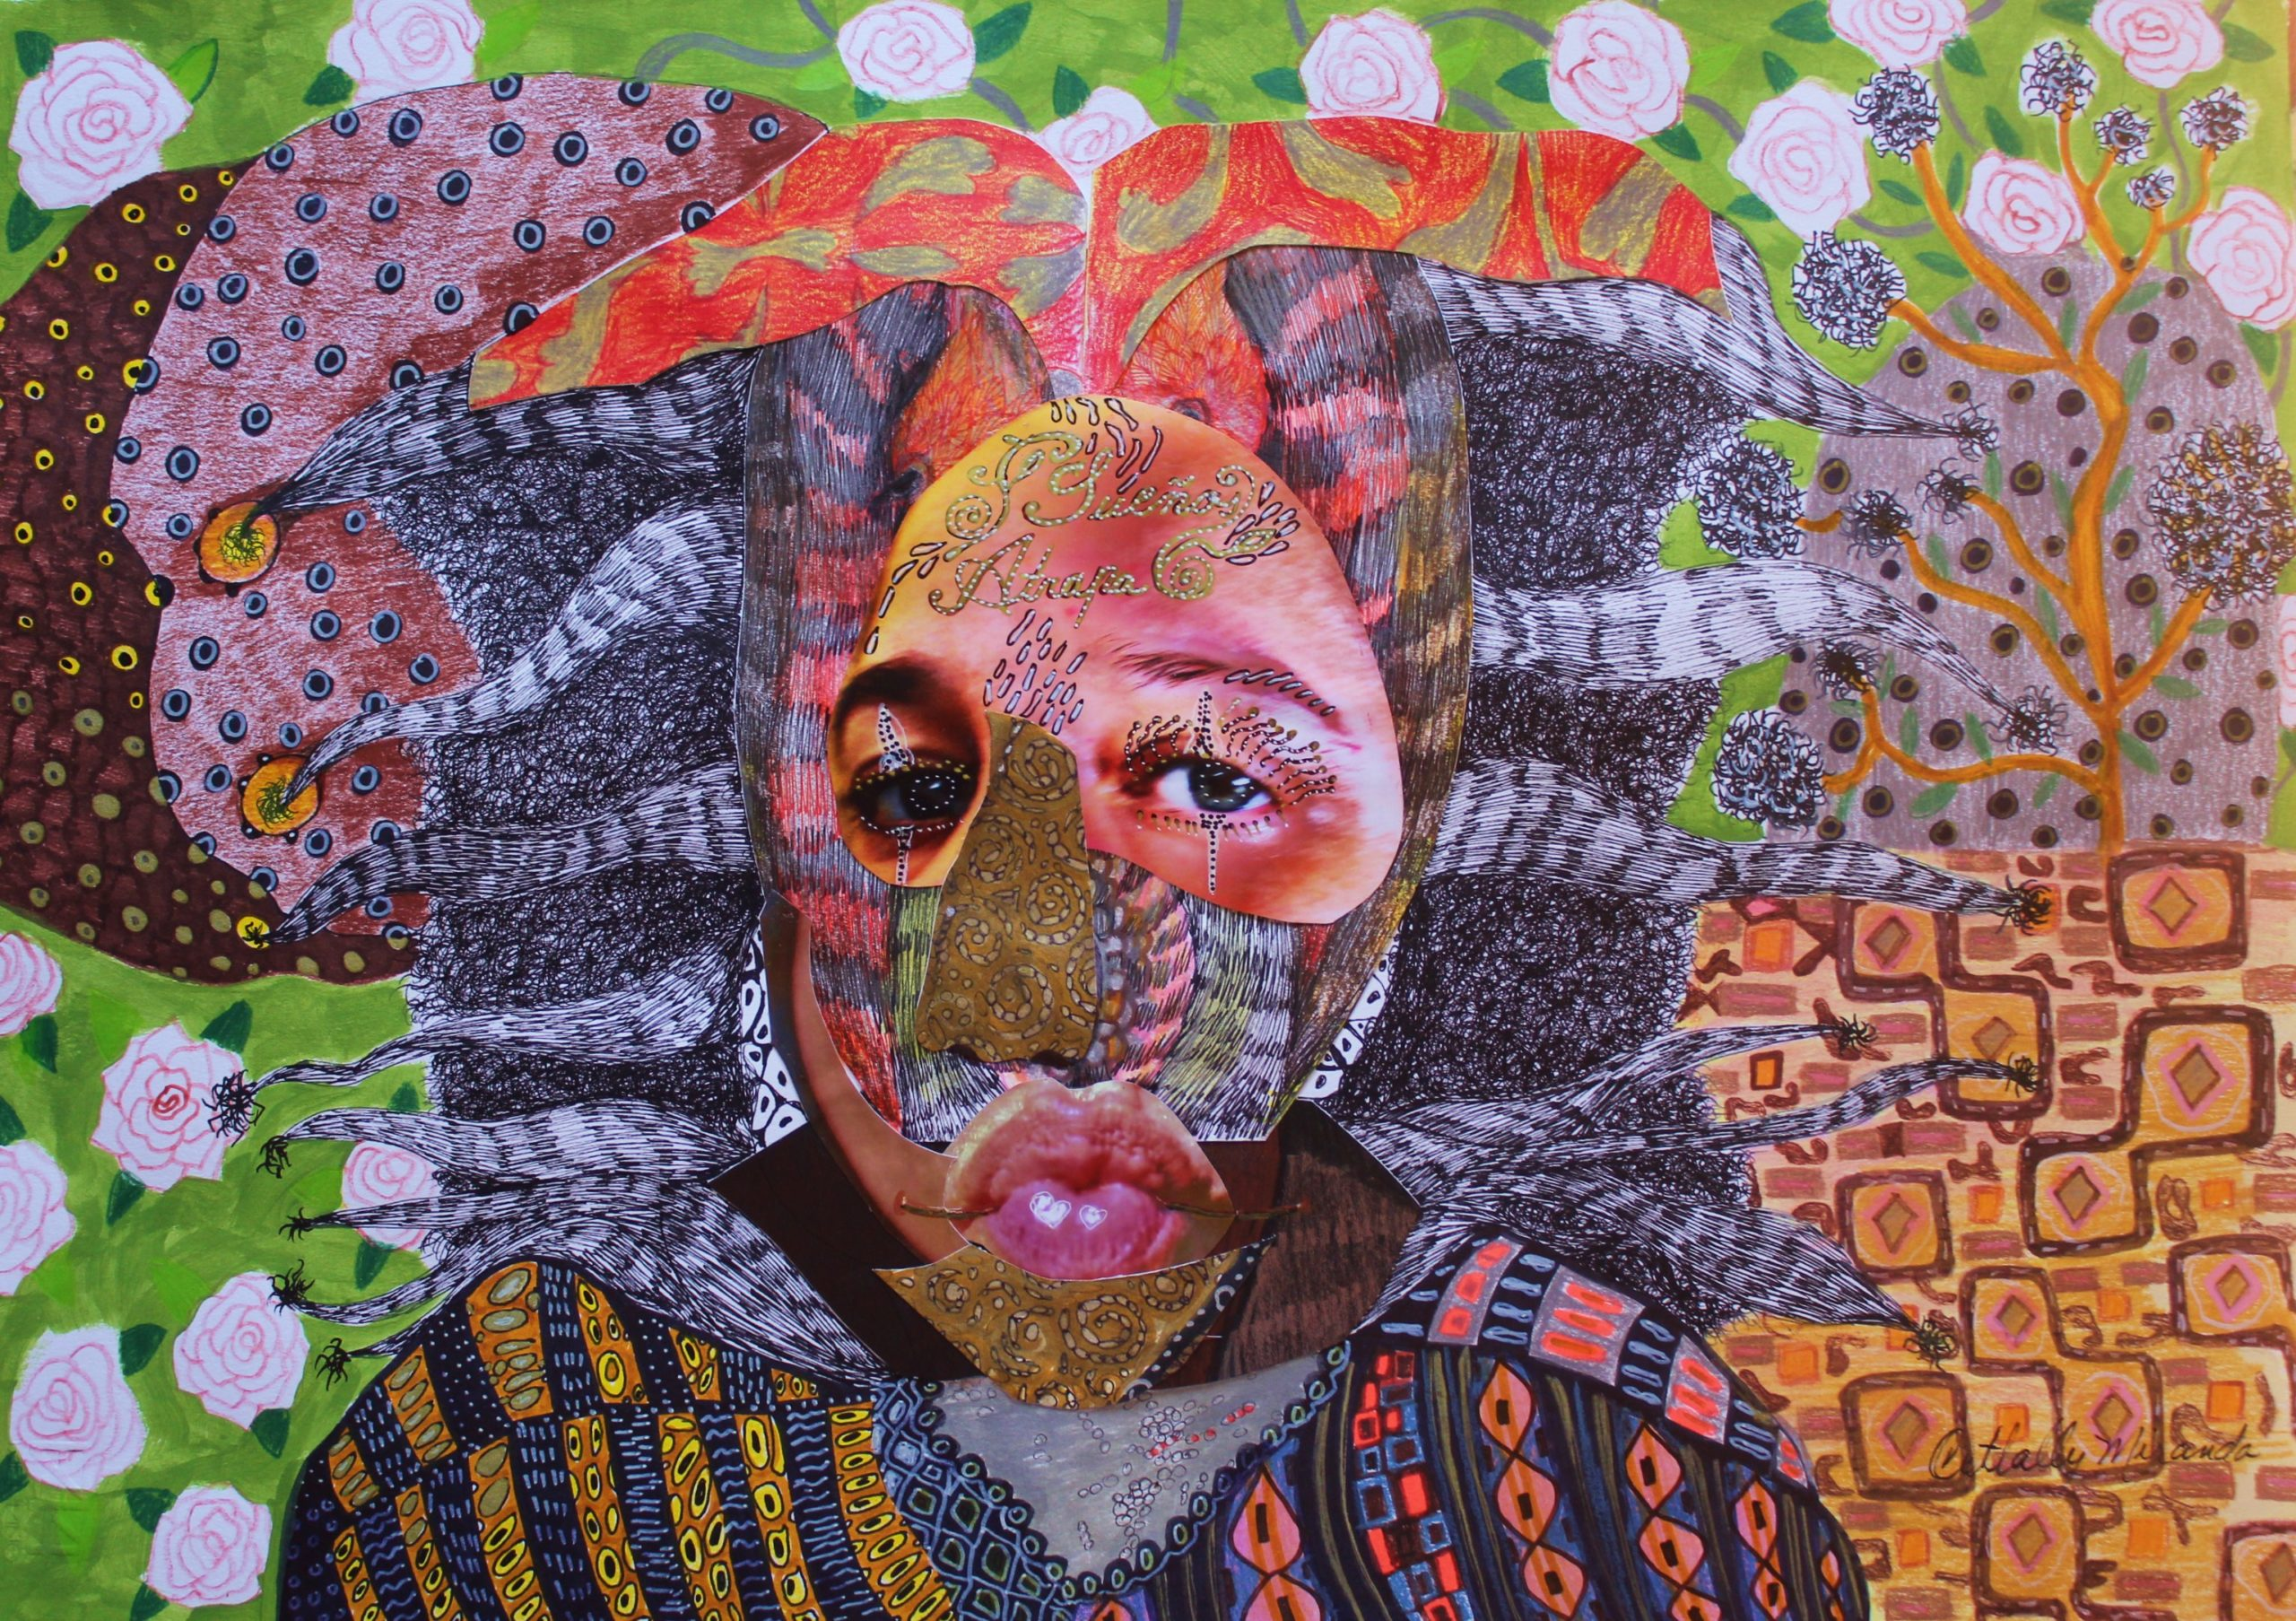 «Payasa atrapa sueño» collage/dibujo/ tintas sobre papel, 2009 CITLALLY MIRANDA. YLONKA NACIDIT-PERDOMO   VII MUJERES MIRANDO MUJERES